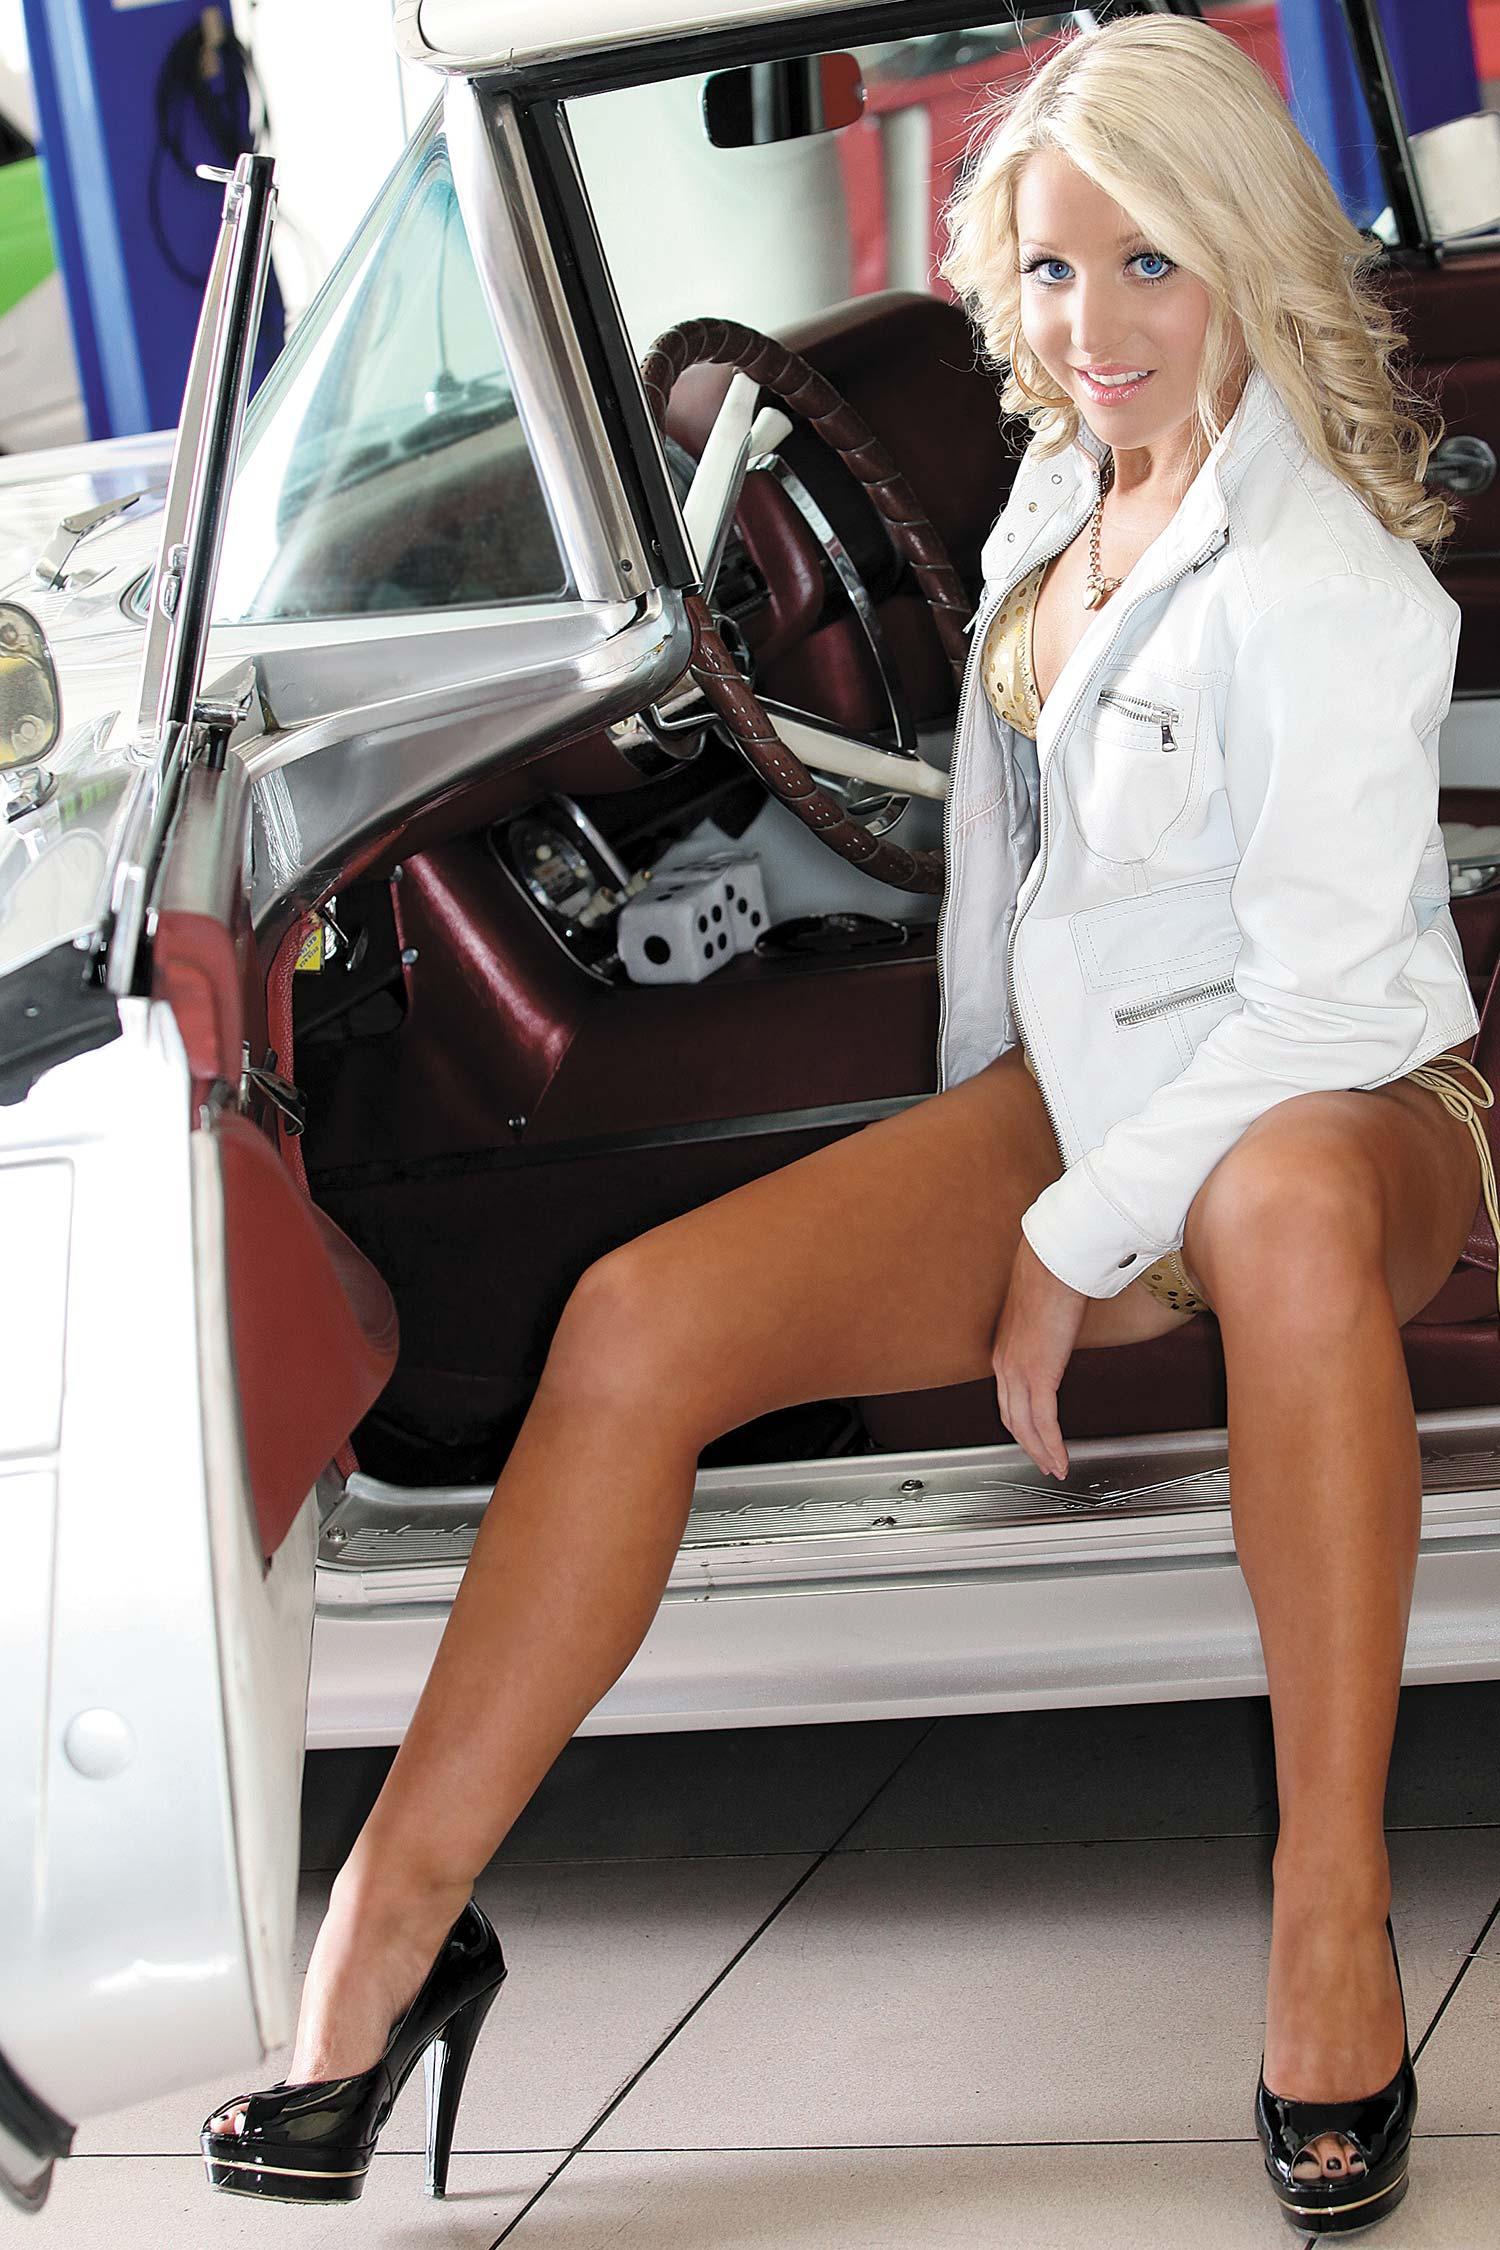 Wallpapers Mustang Pinup Car Girl Cars Women Models Muscle